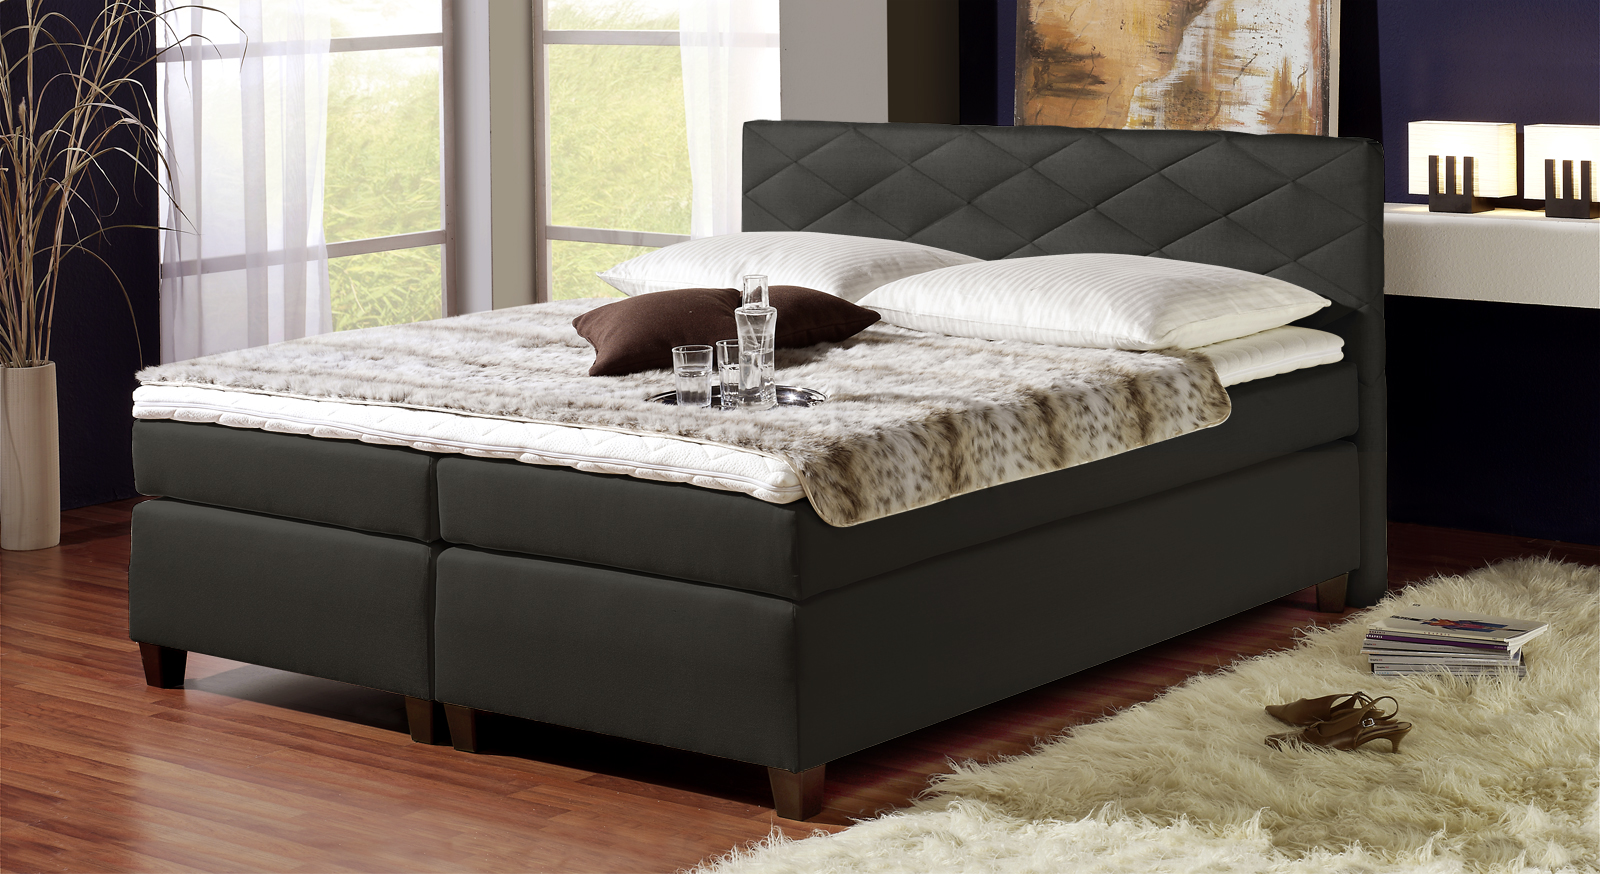 boxspringbett g nstig 140 200 bilder das sieht ehrfurcht. Black Bedroom Furniture Sets. Home Design Ideas